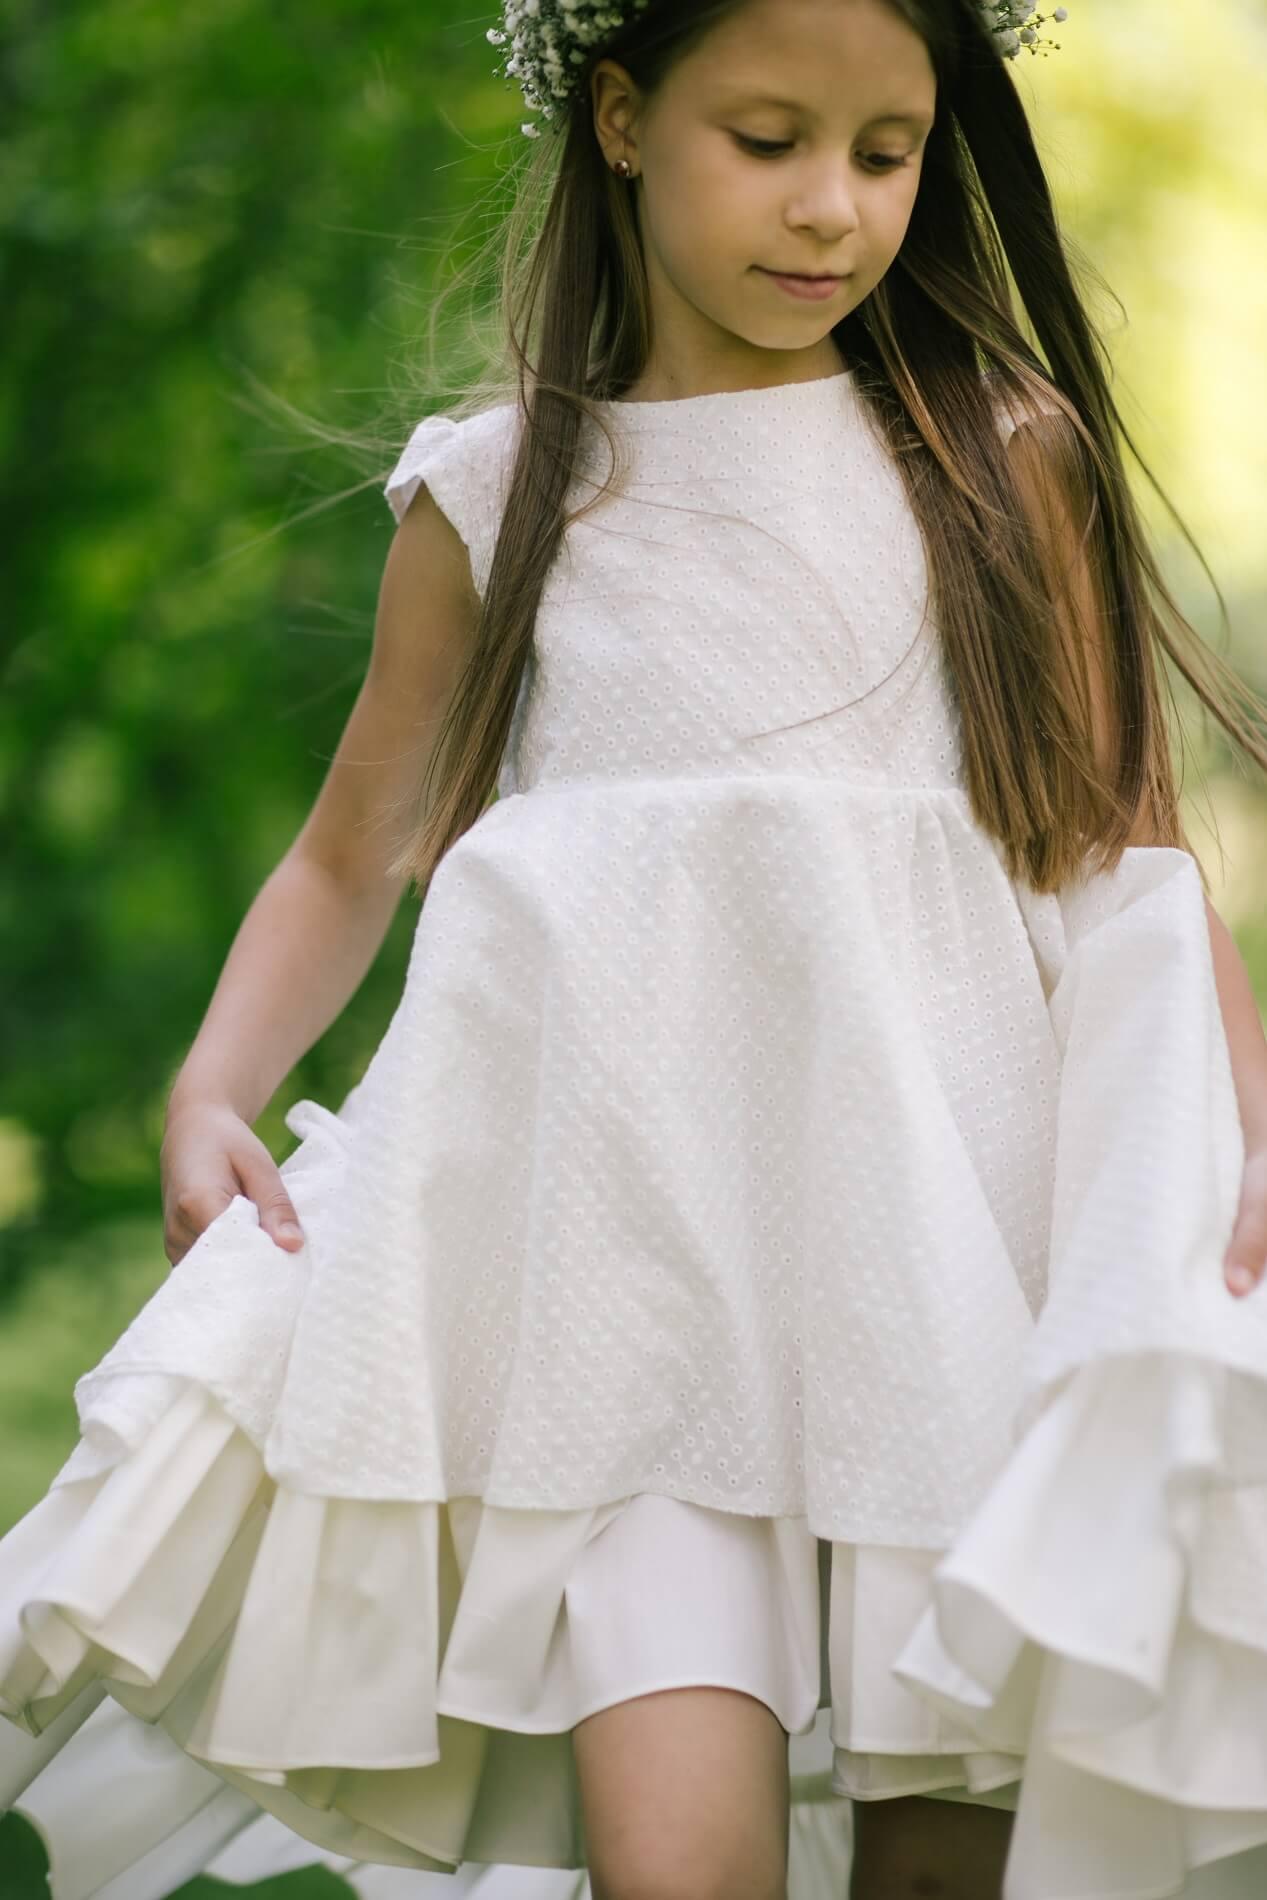 сукня біла лытня на дівчинку святкова - Malyna 45af207d2b464